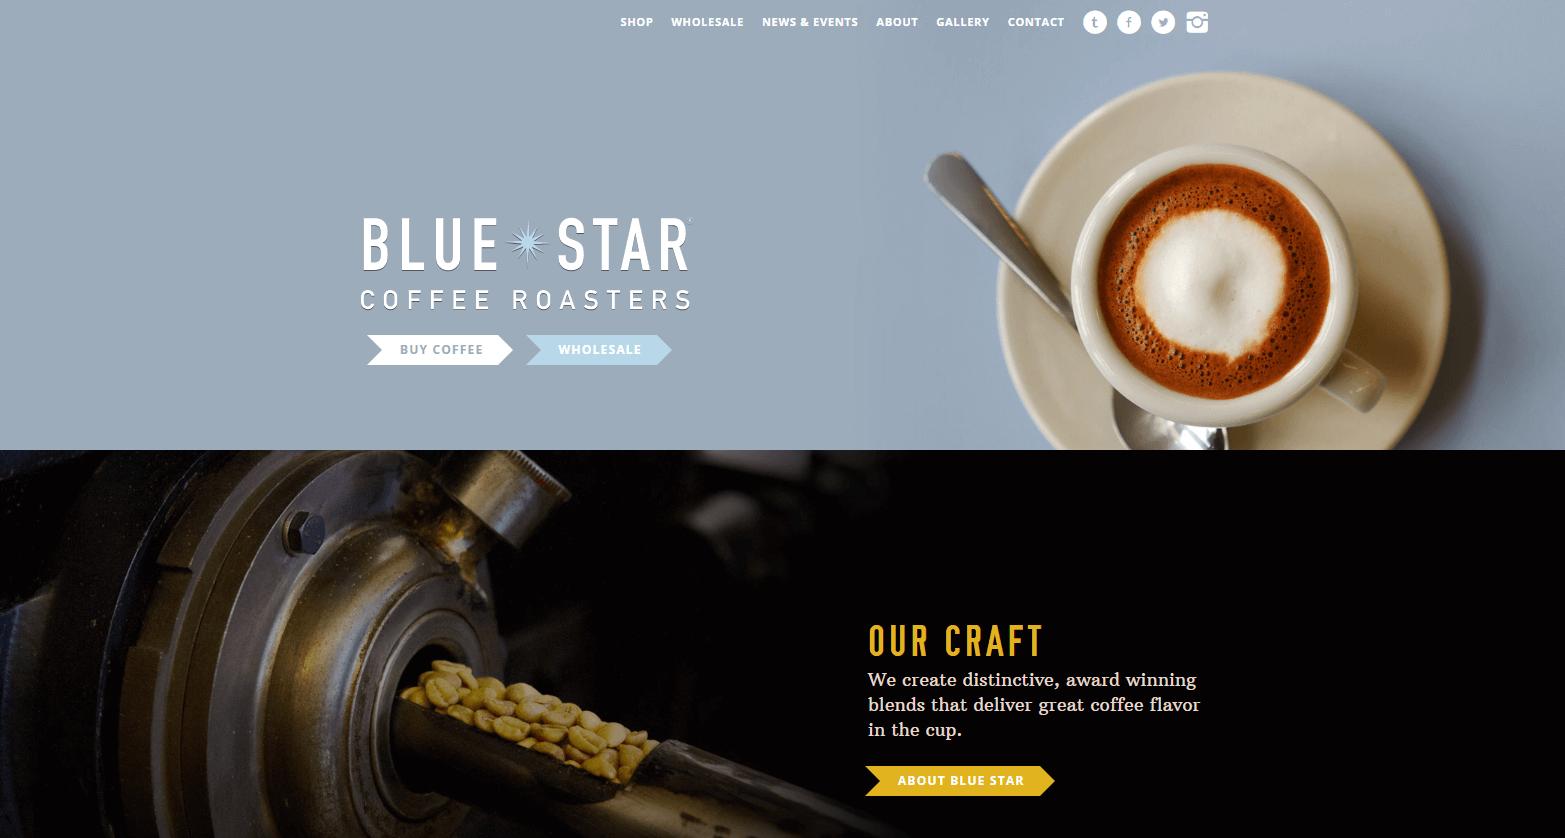 The Blue Star website.